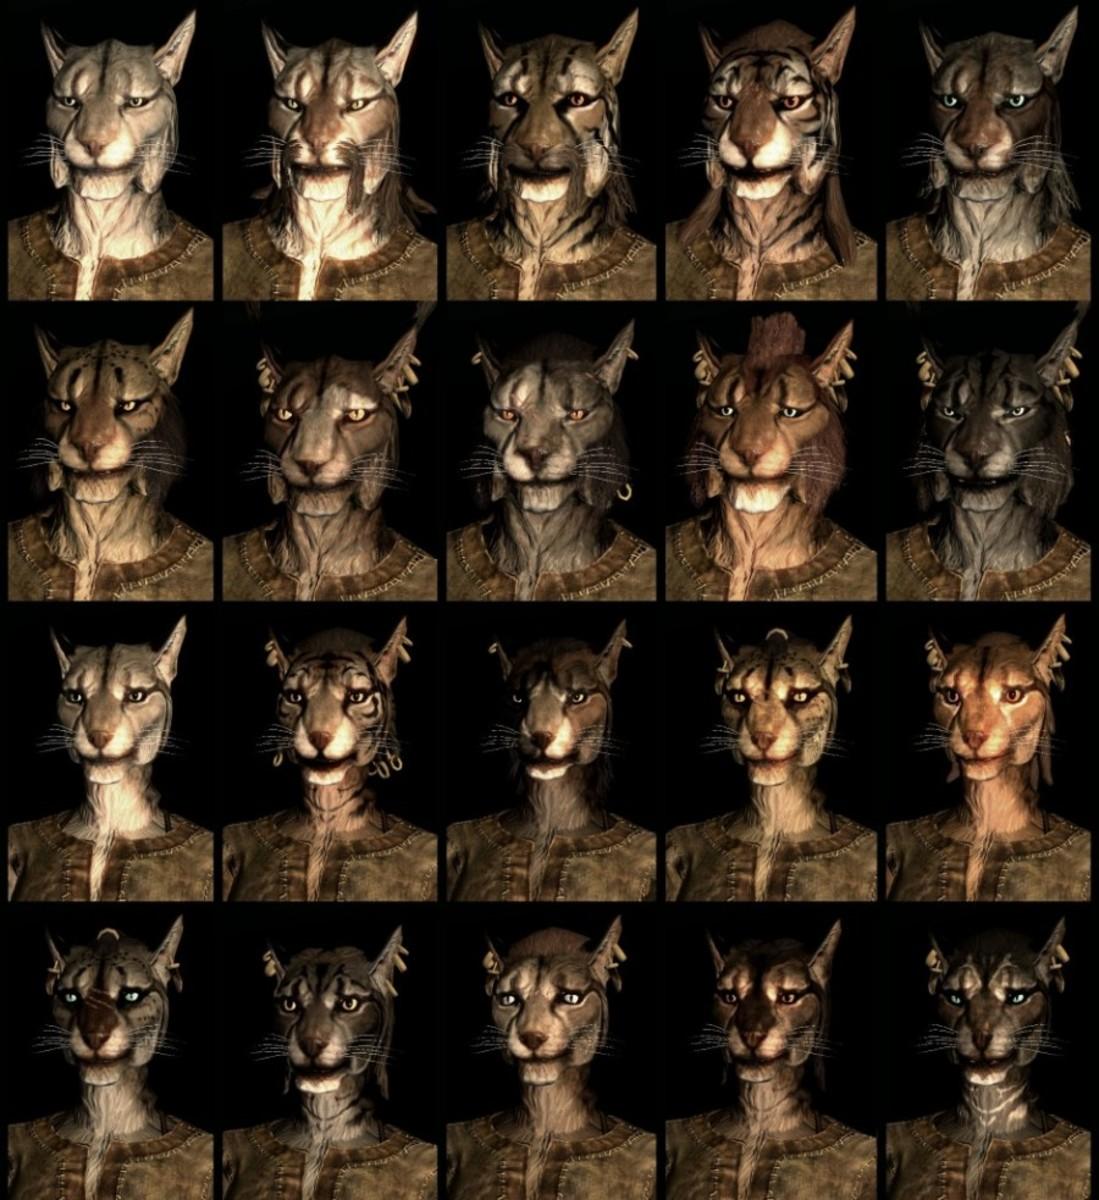 Compilation of Skyrim Khajiit faces